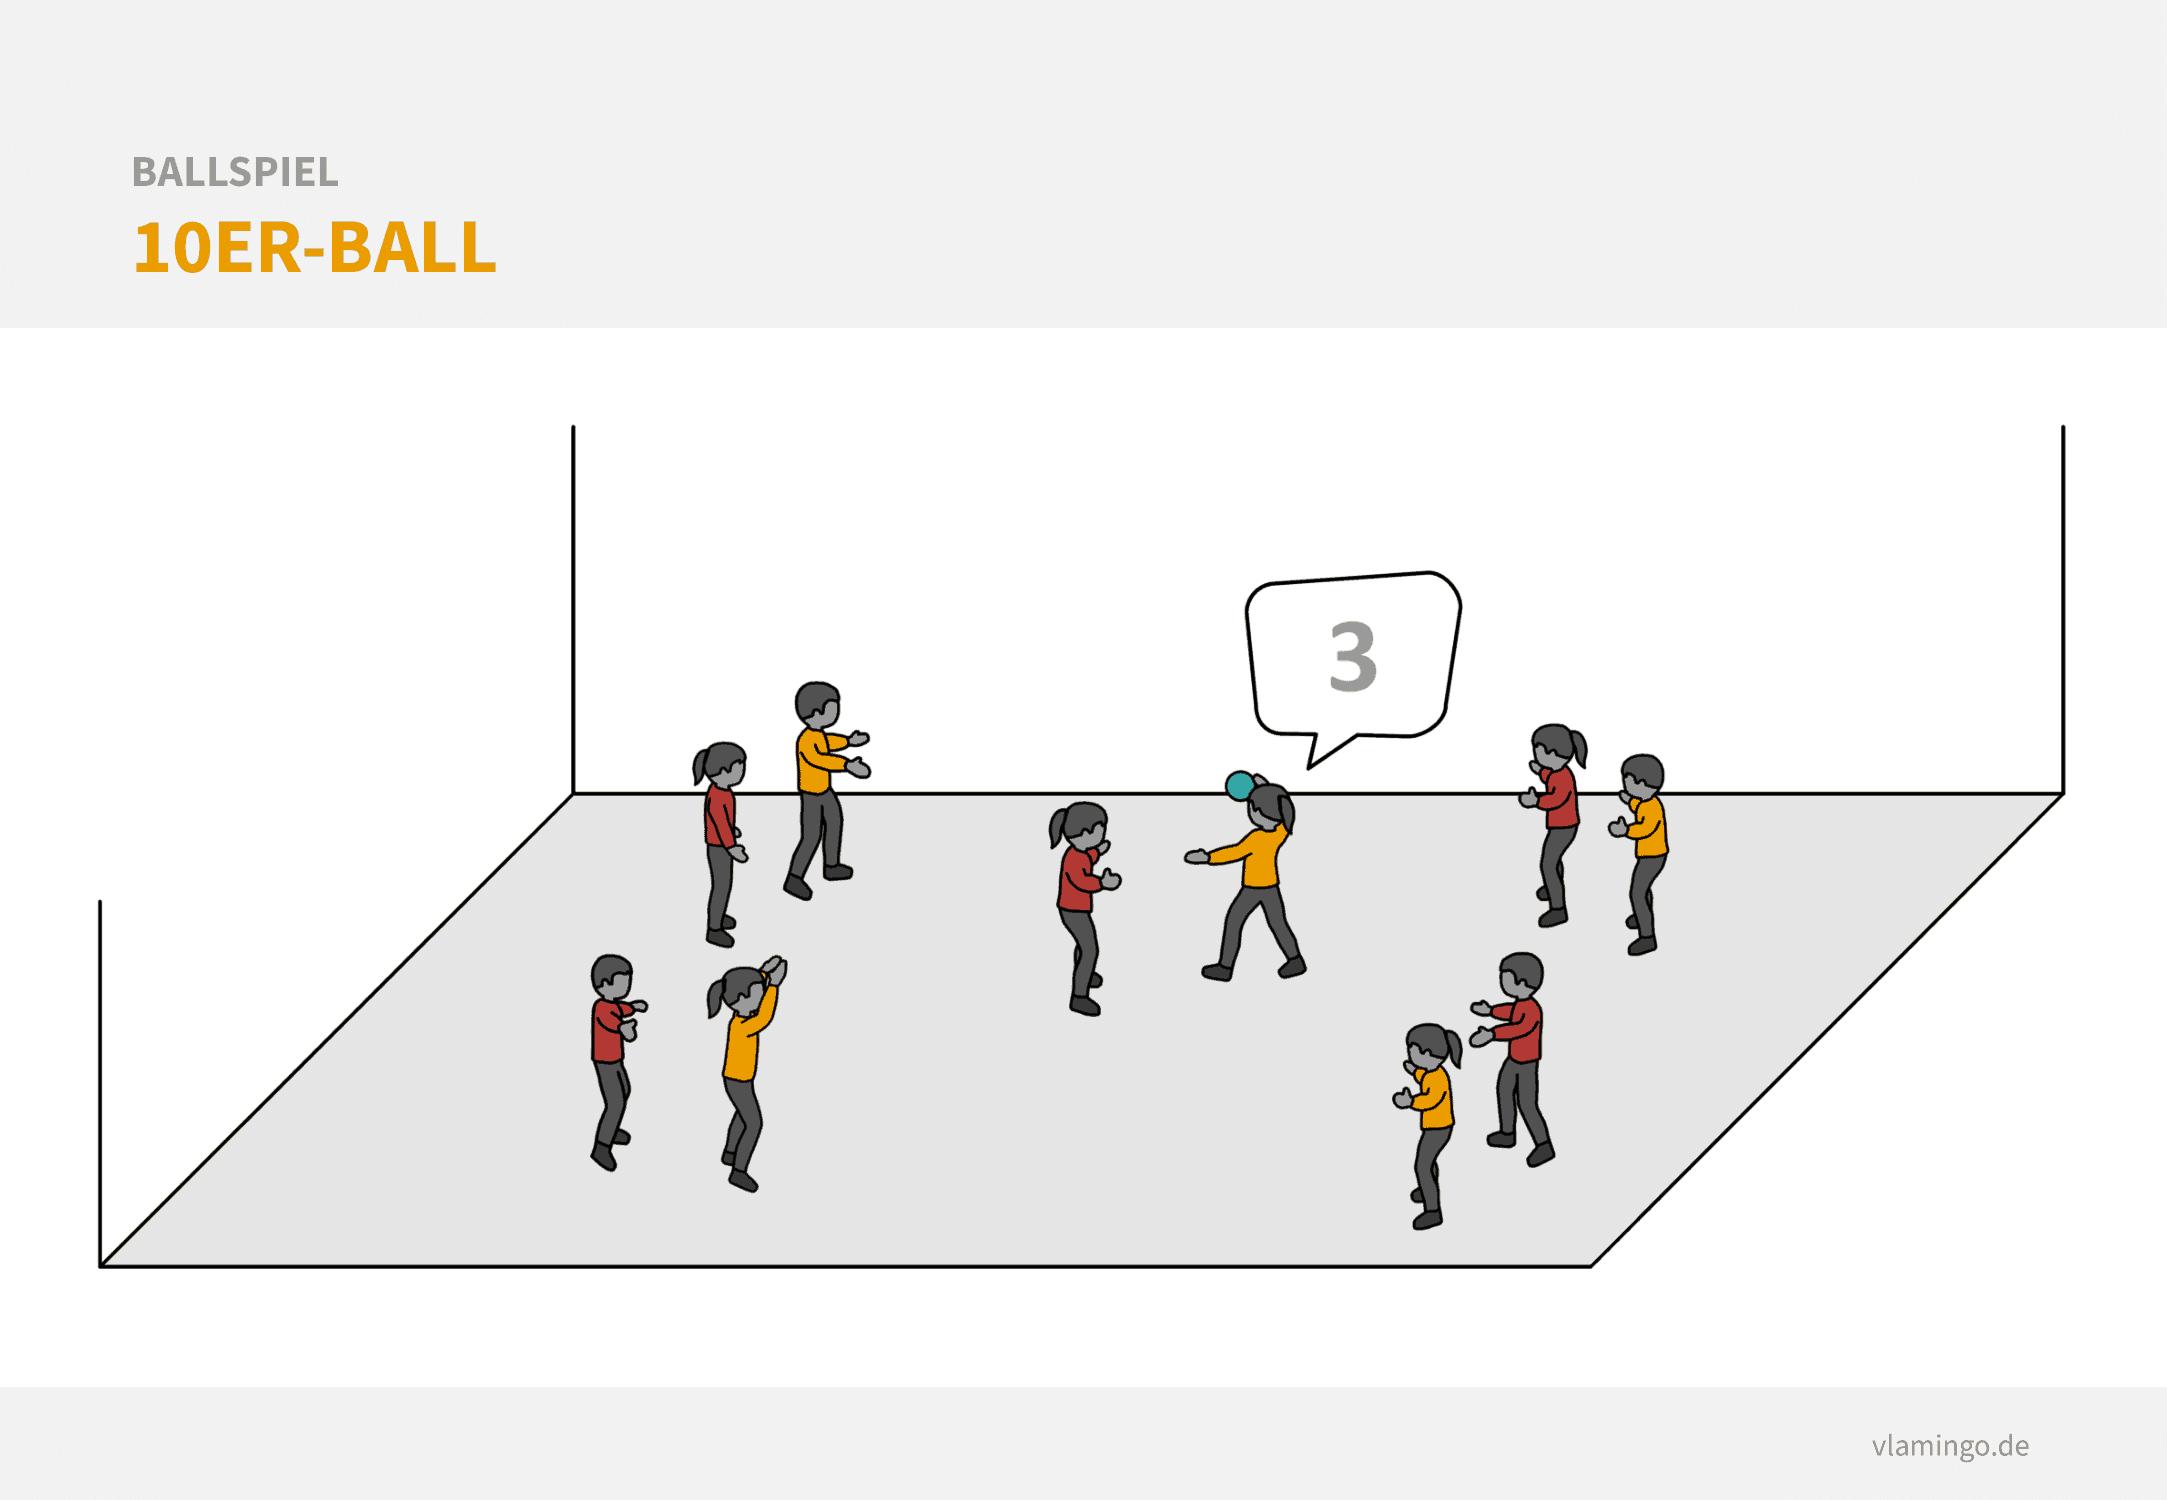 Ballspiel: 10er-Ball